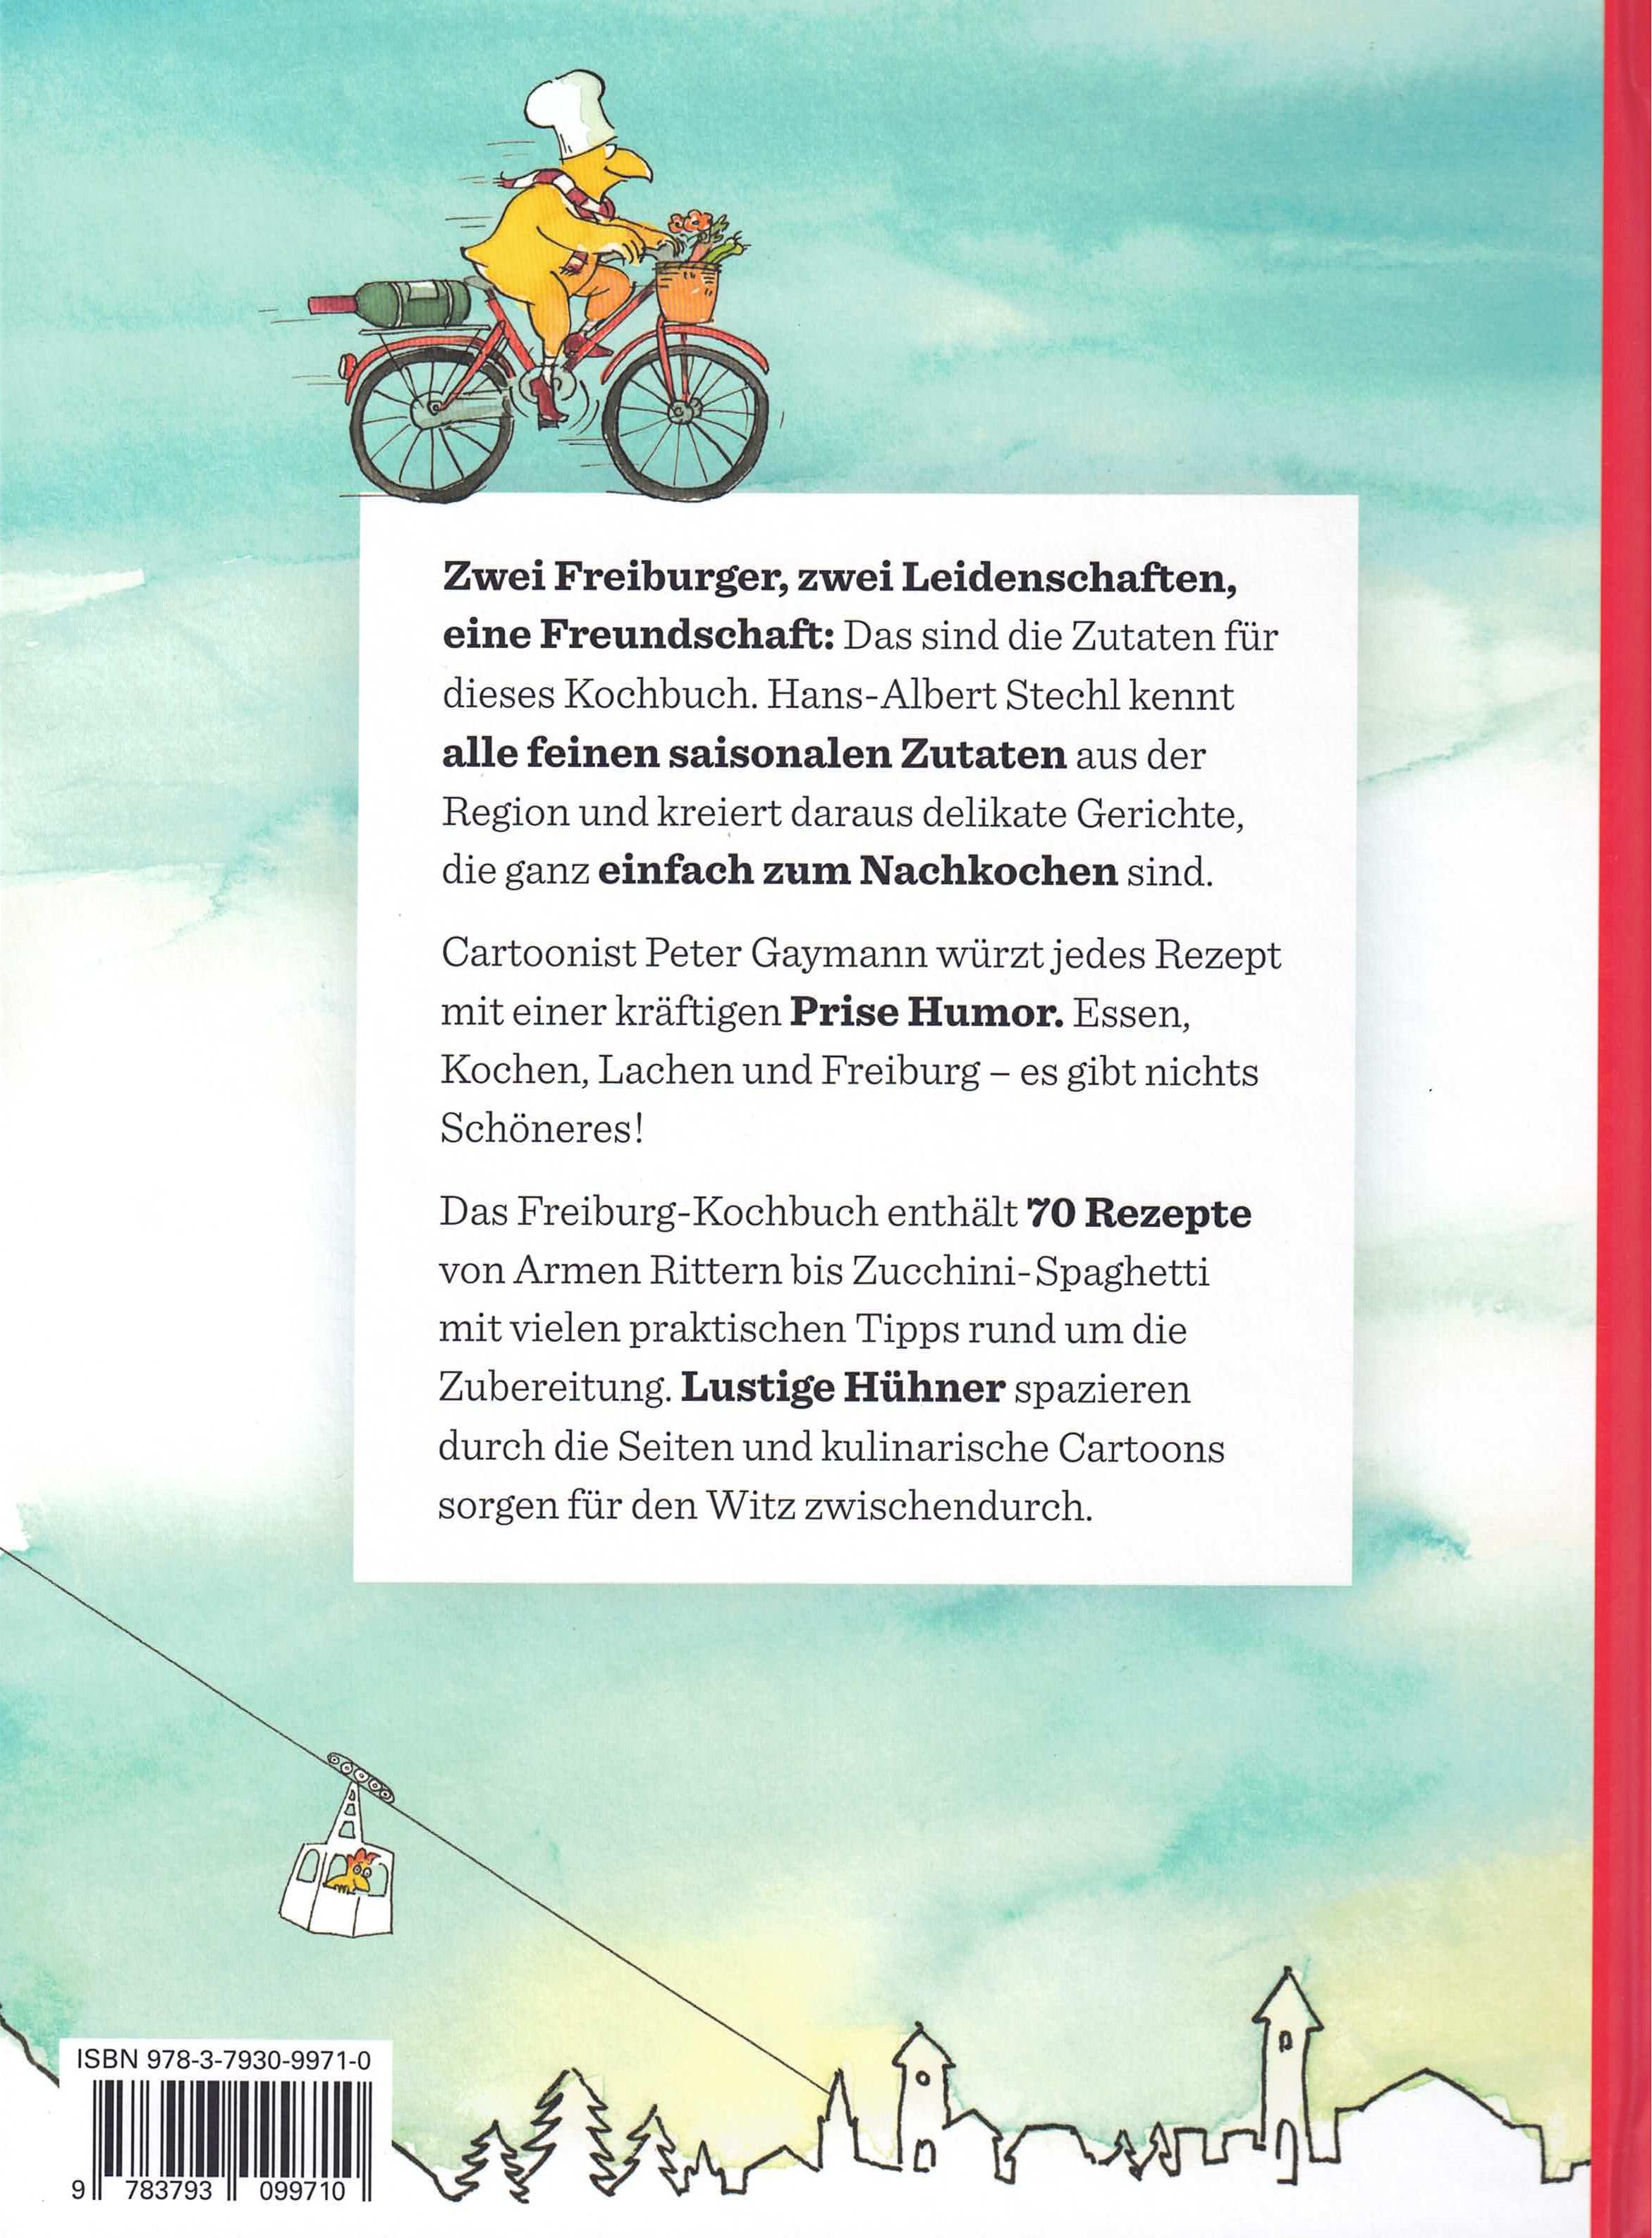 Münsterladen Freiburg Buch Gaymann Freiburg Kochbuch